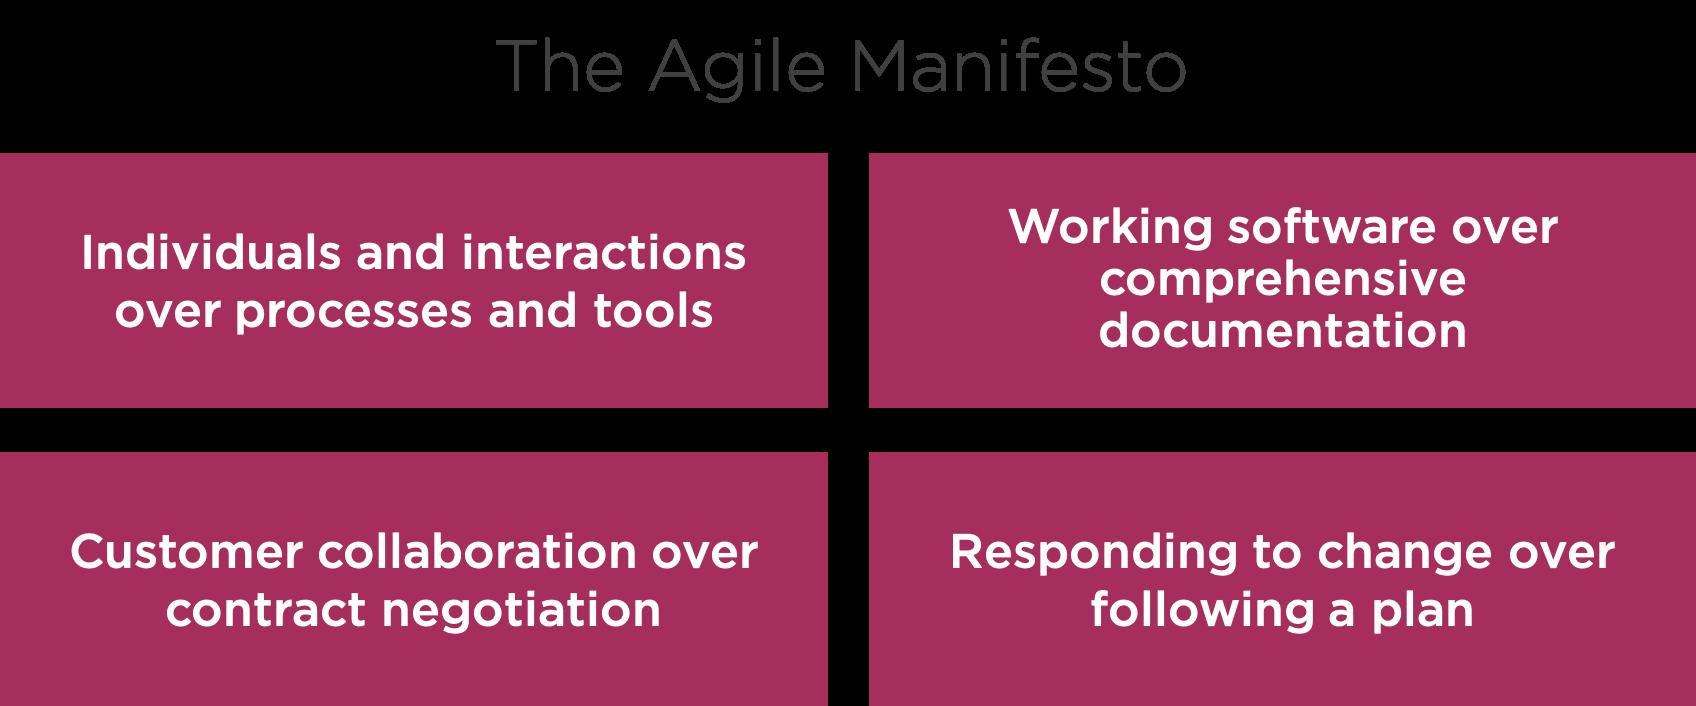 the agile manifesto